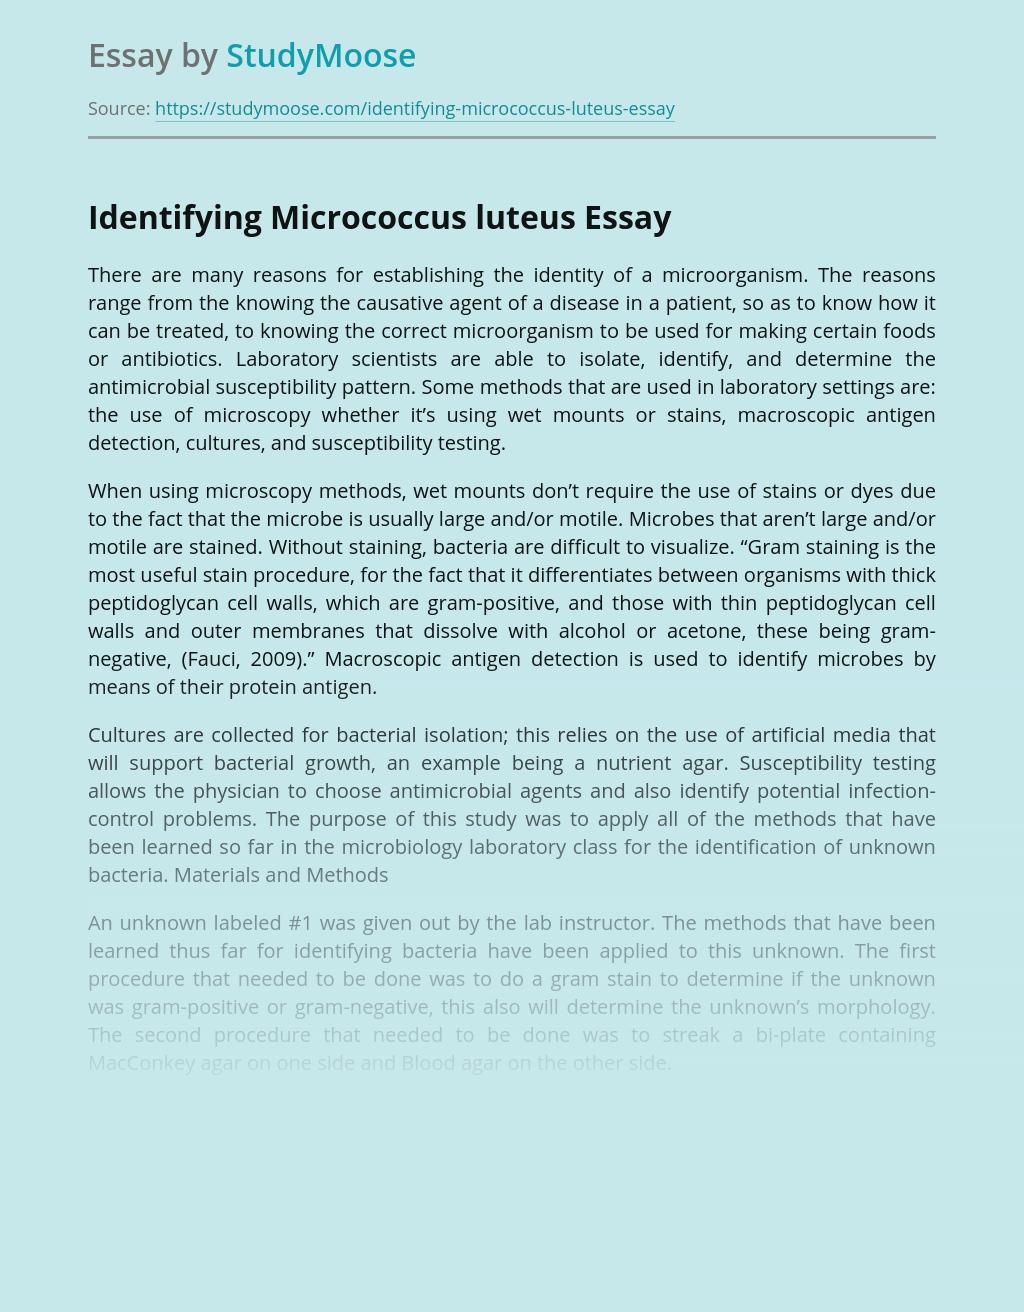 Identifying Micrococcus luteus